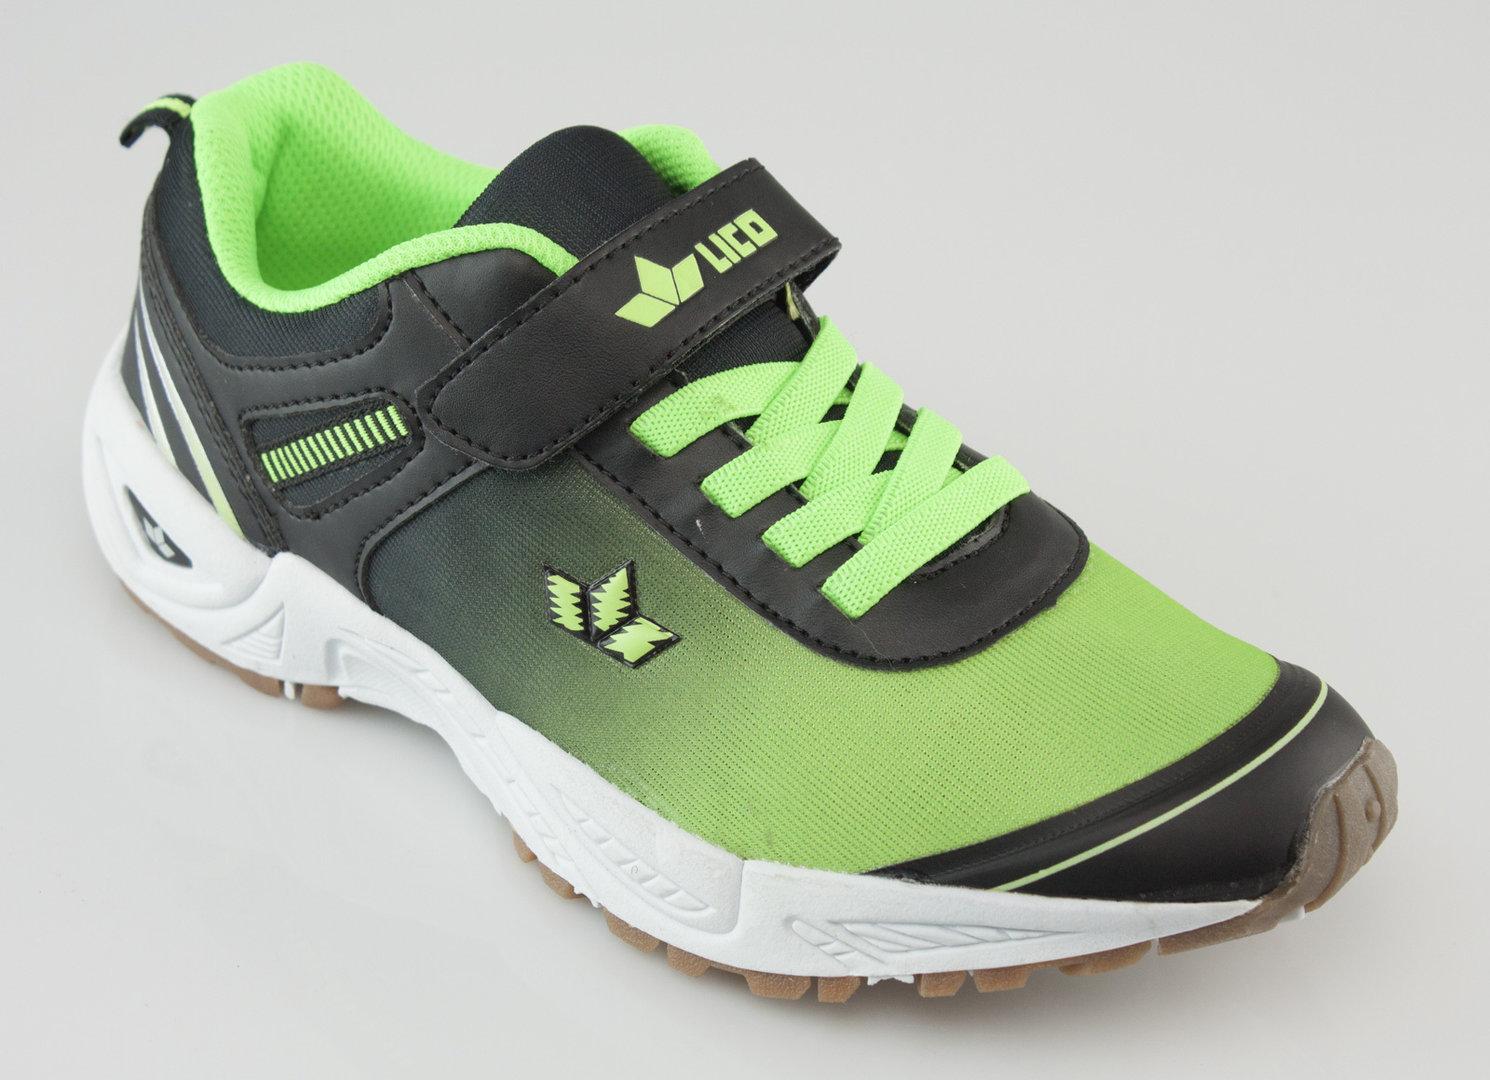 Lico 360492 BARNEY VS velcro shoes